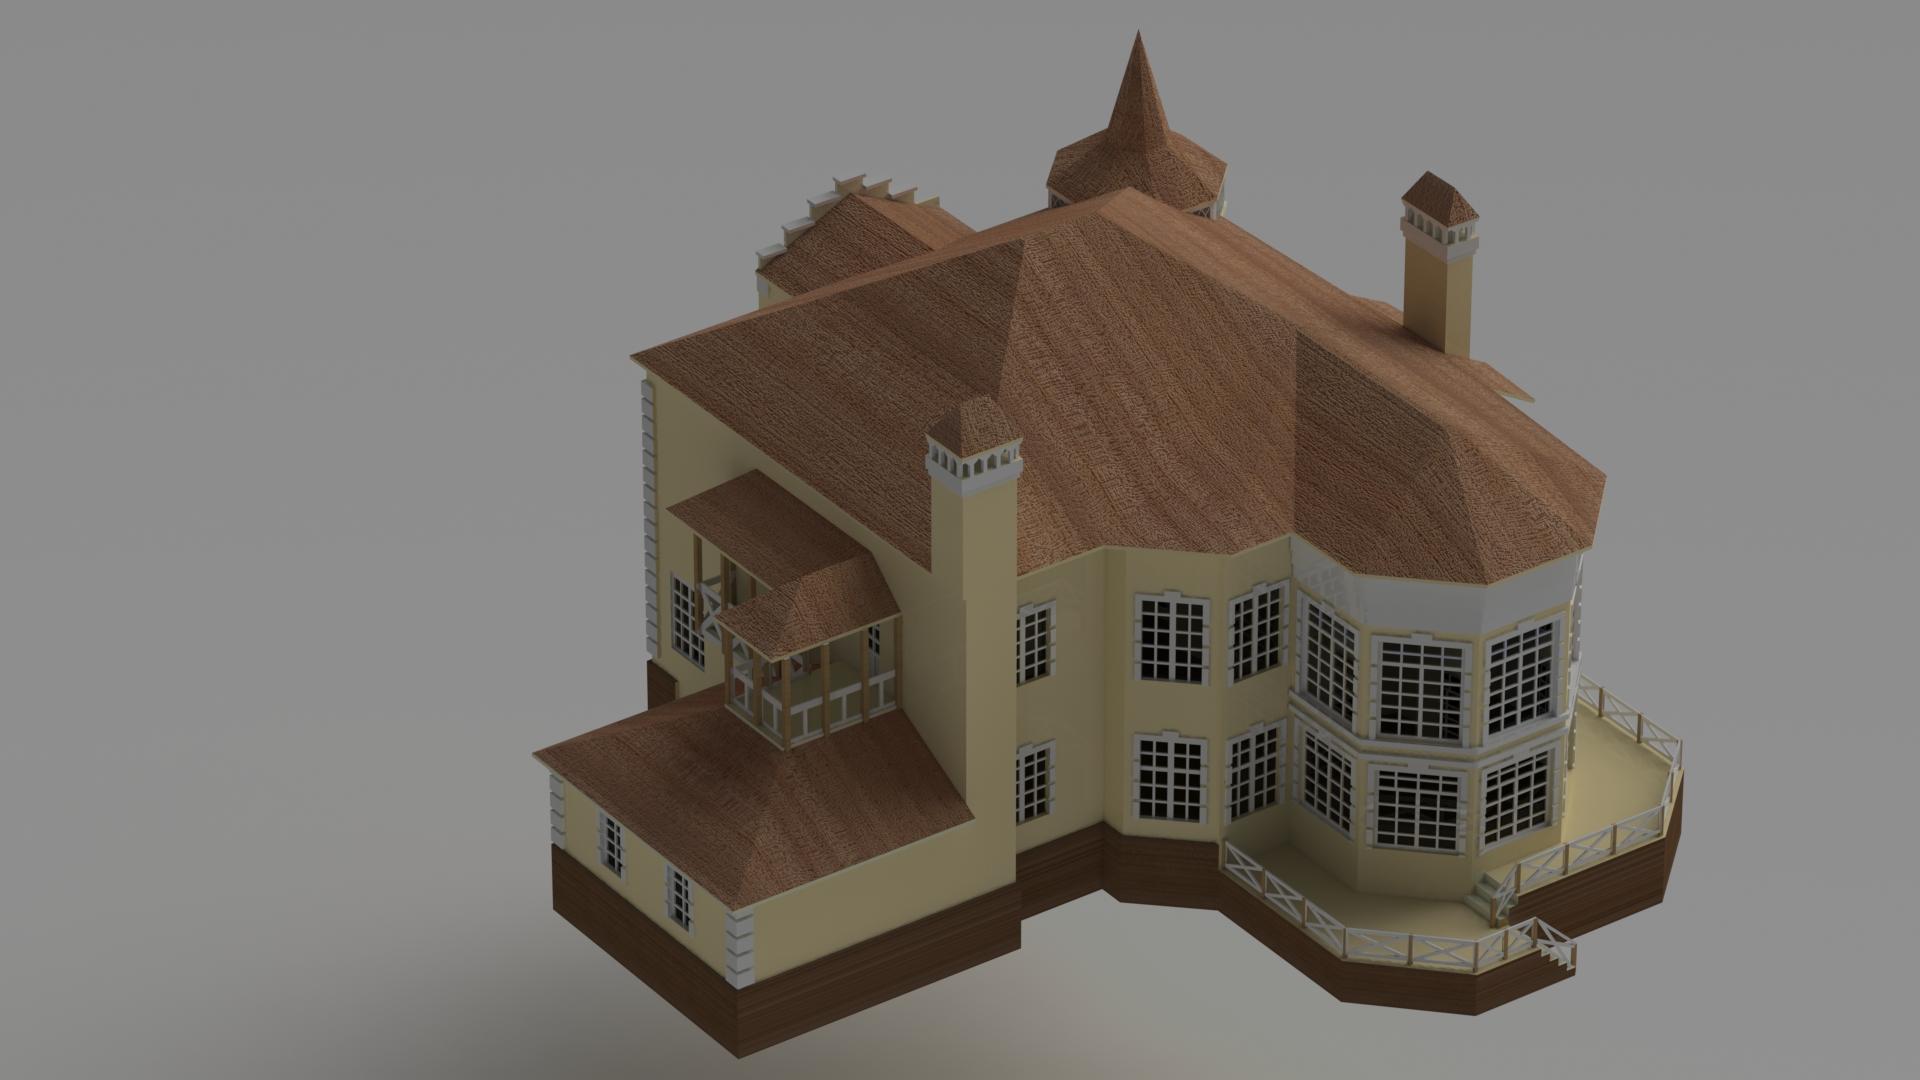 manor洋房别墅模型3D图纸 Solidworks设计 附STEP